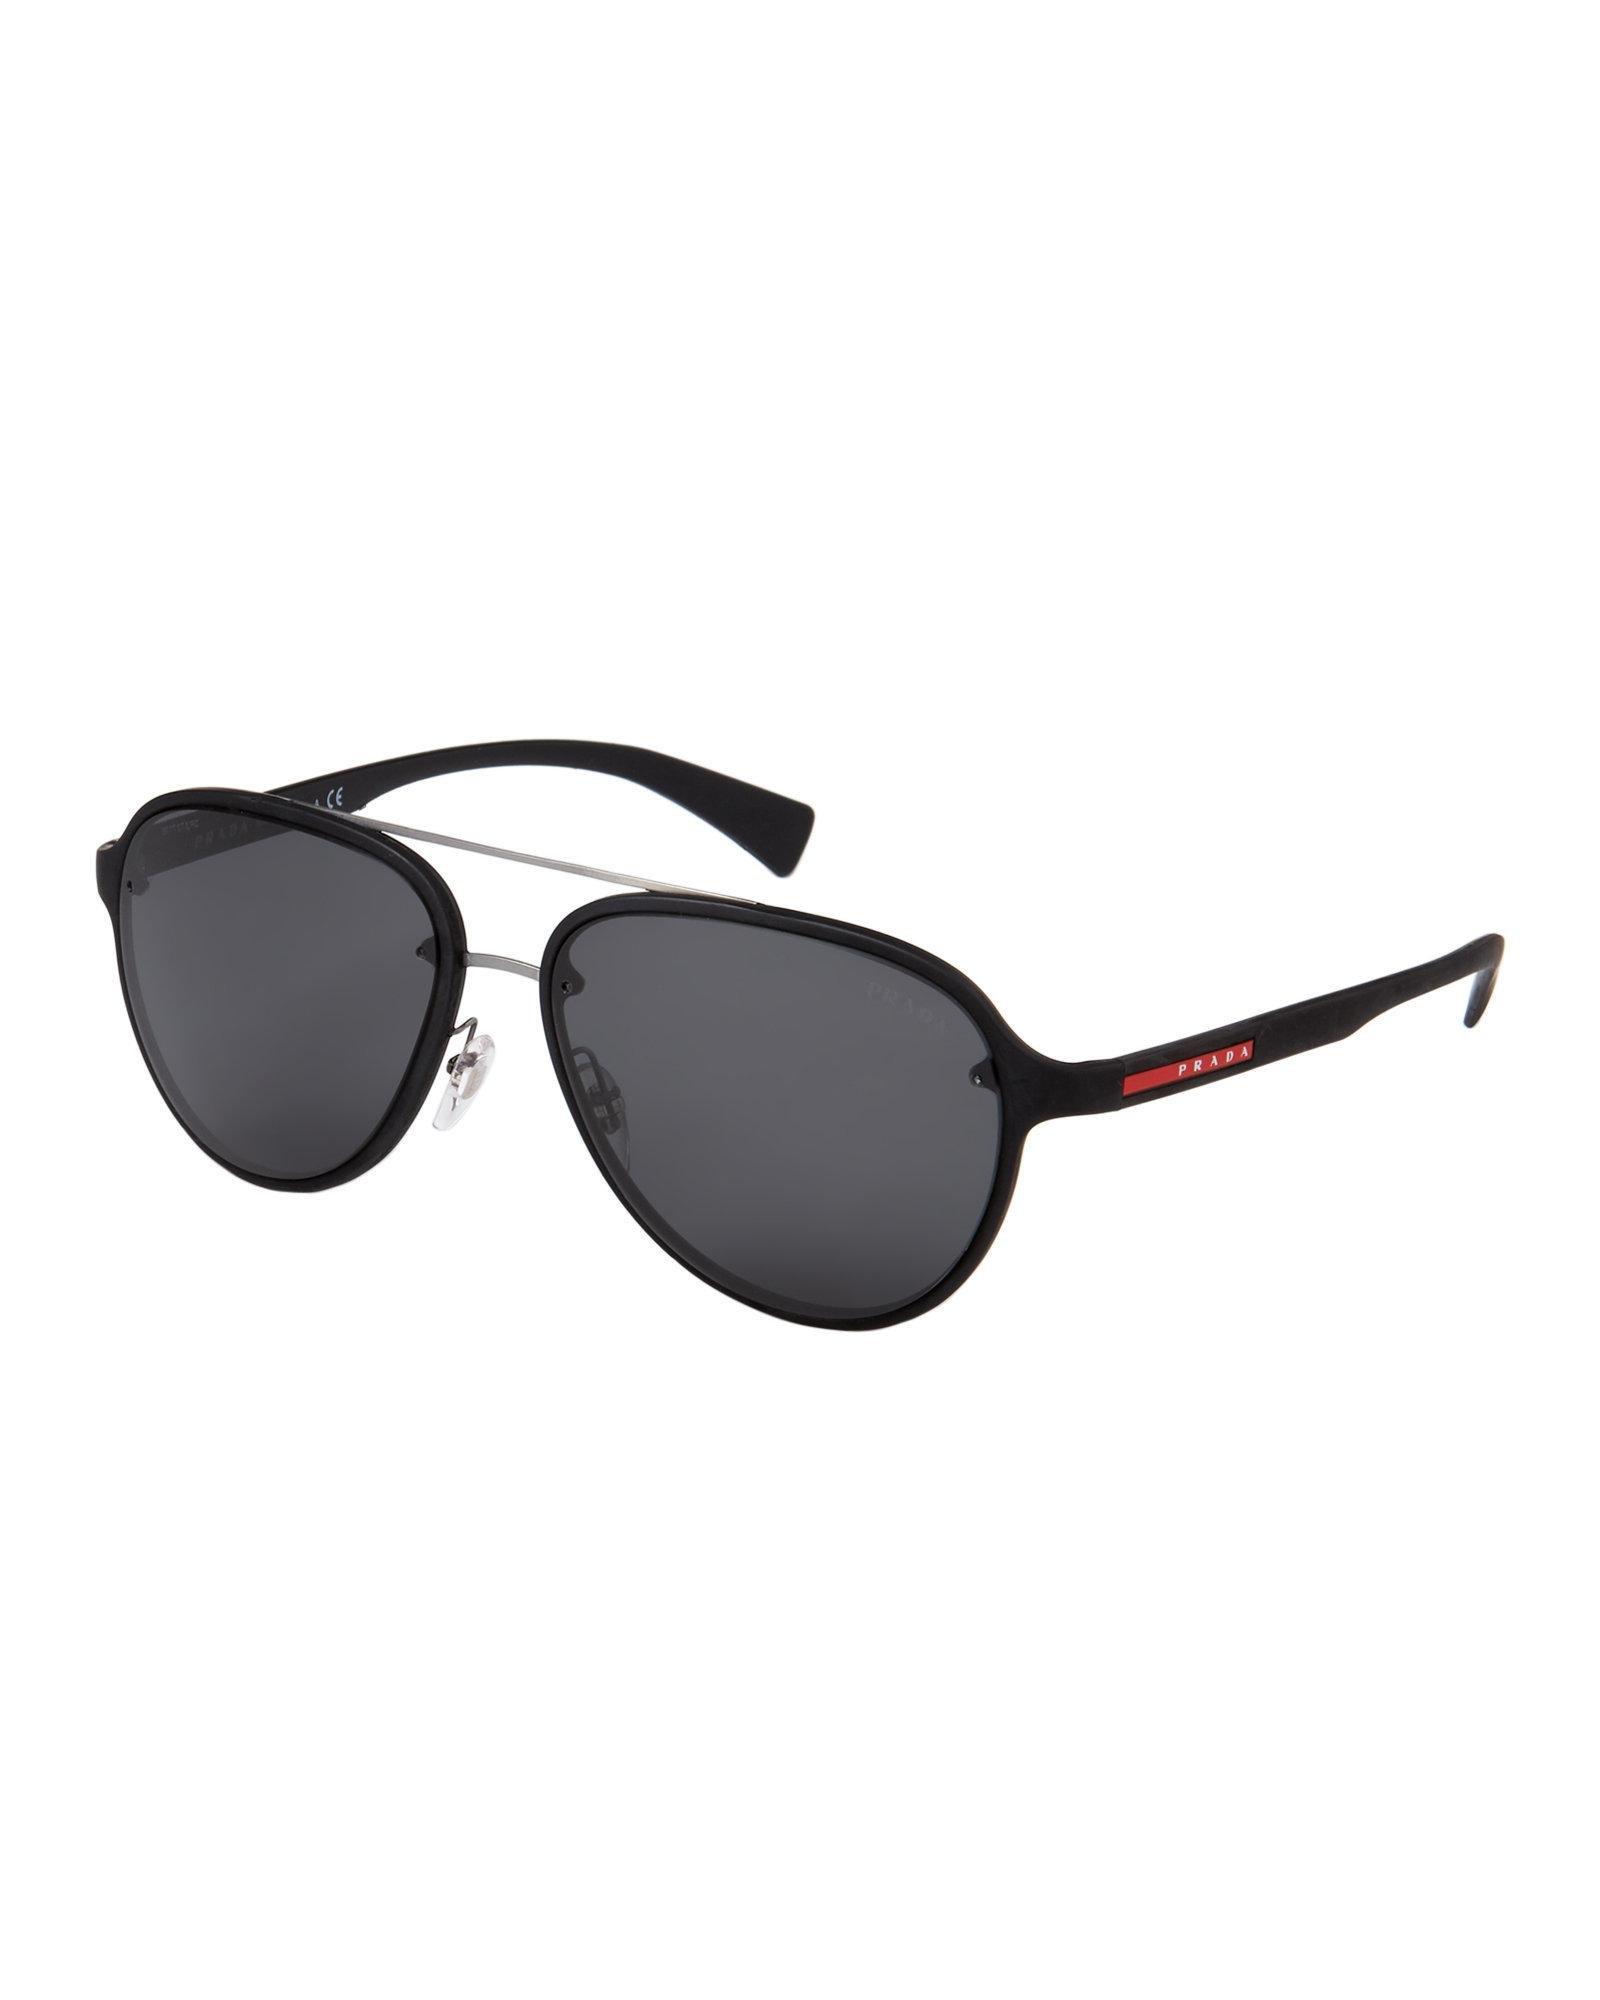 ce44a4092abad Prada Sport Sps 52s Black Aviator Sunglasses in Black - Lyst